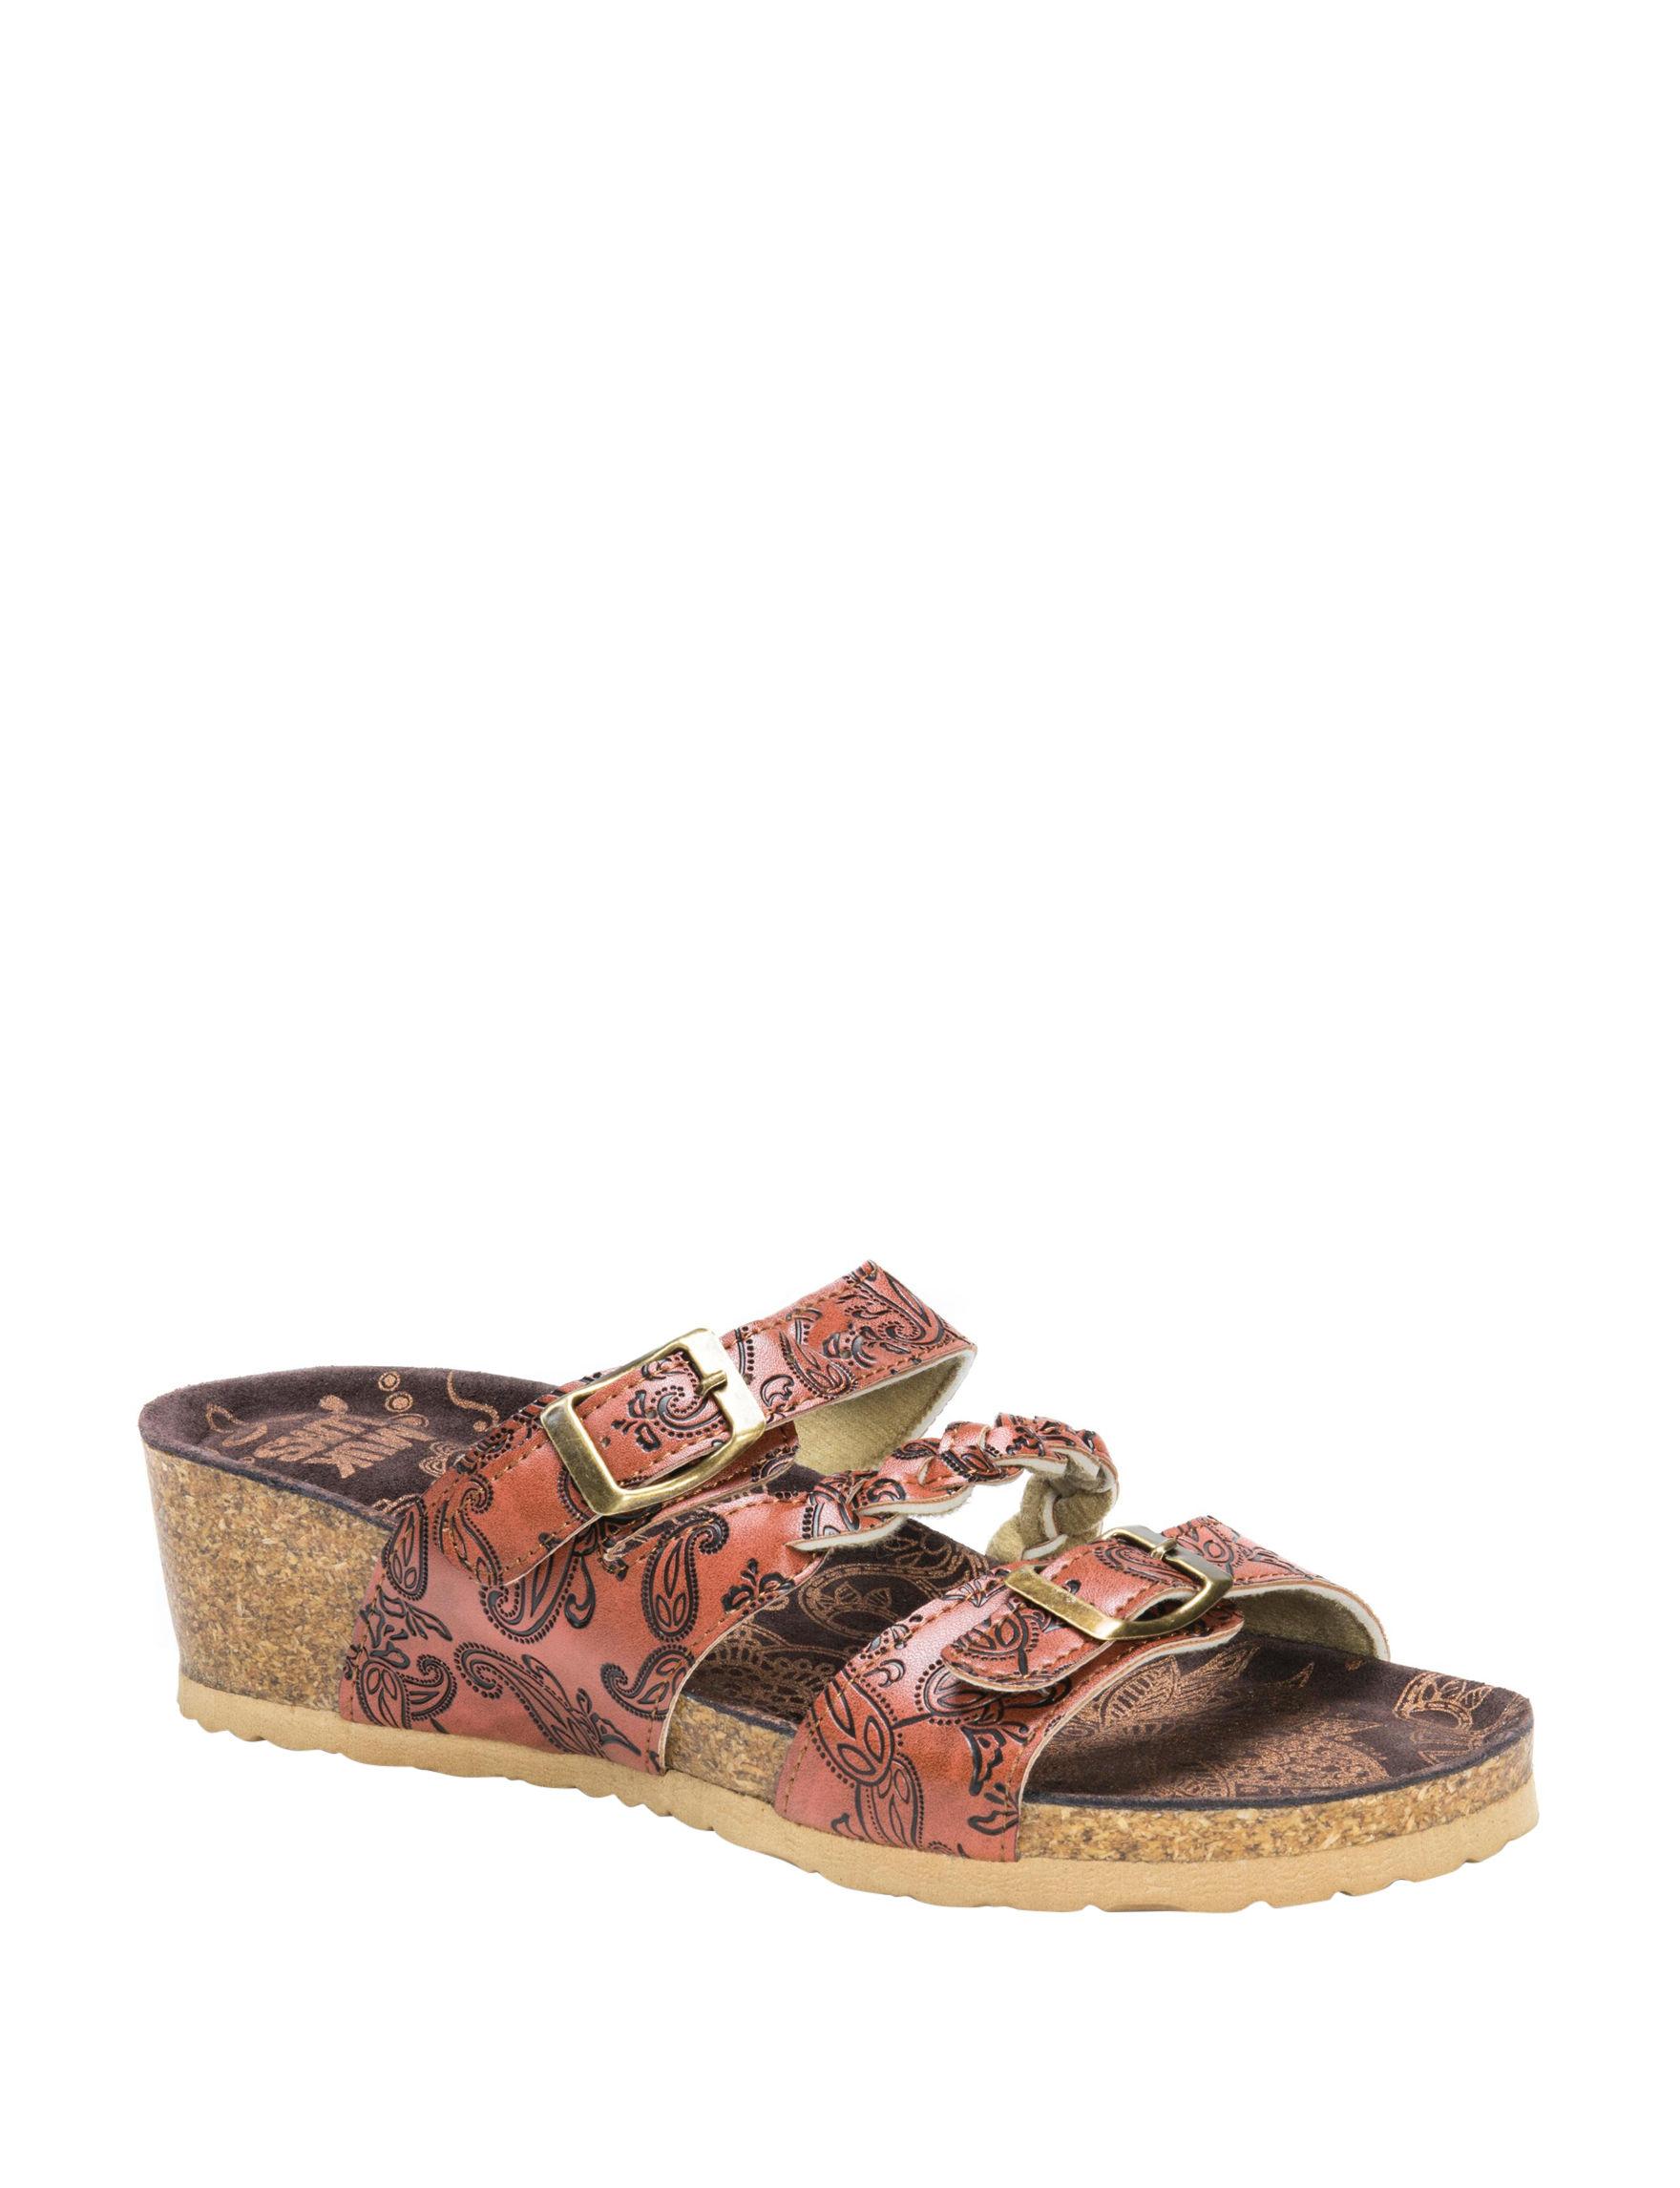 Muk Luks Brown Wedge Sandals